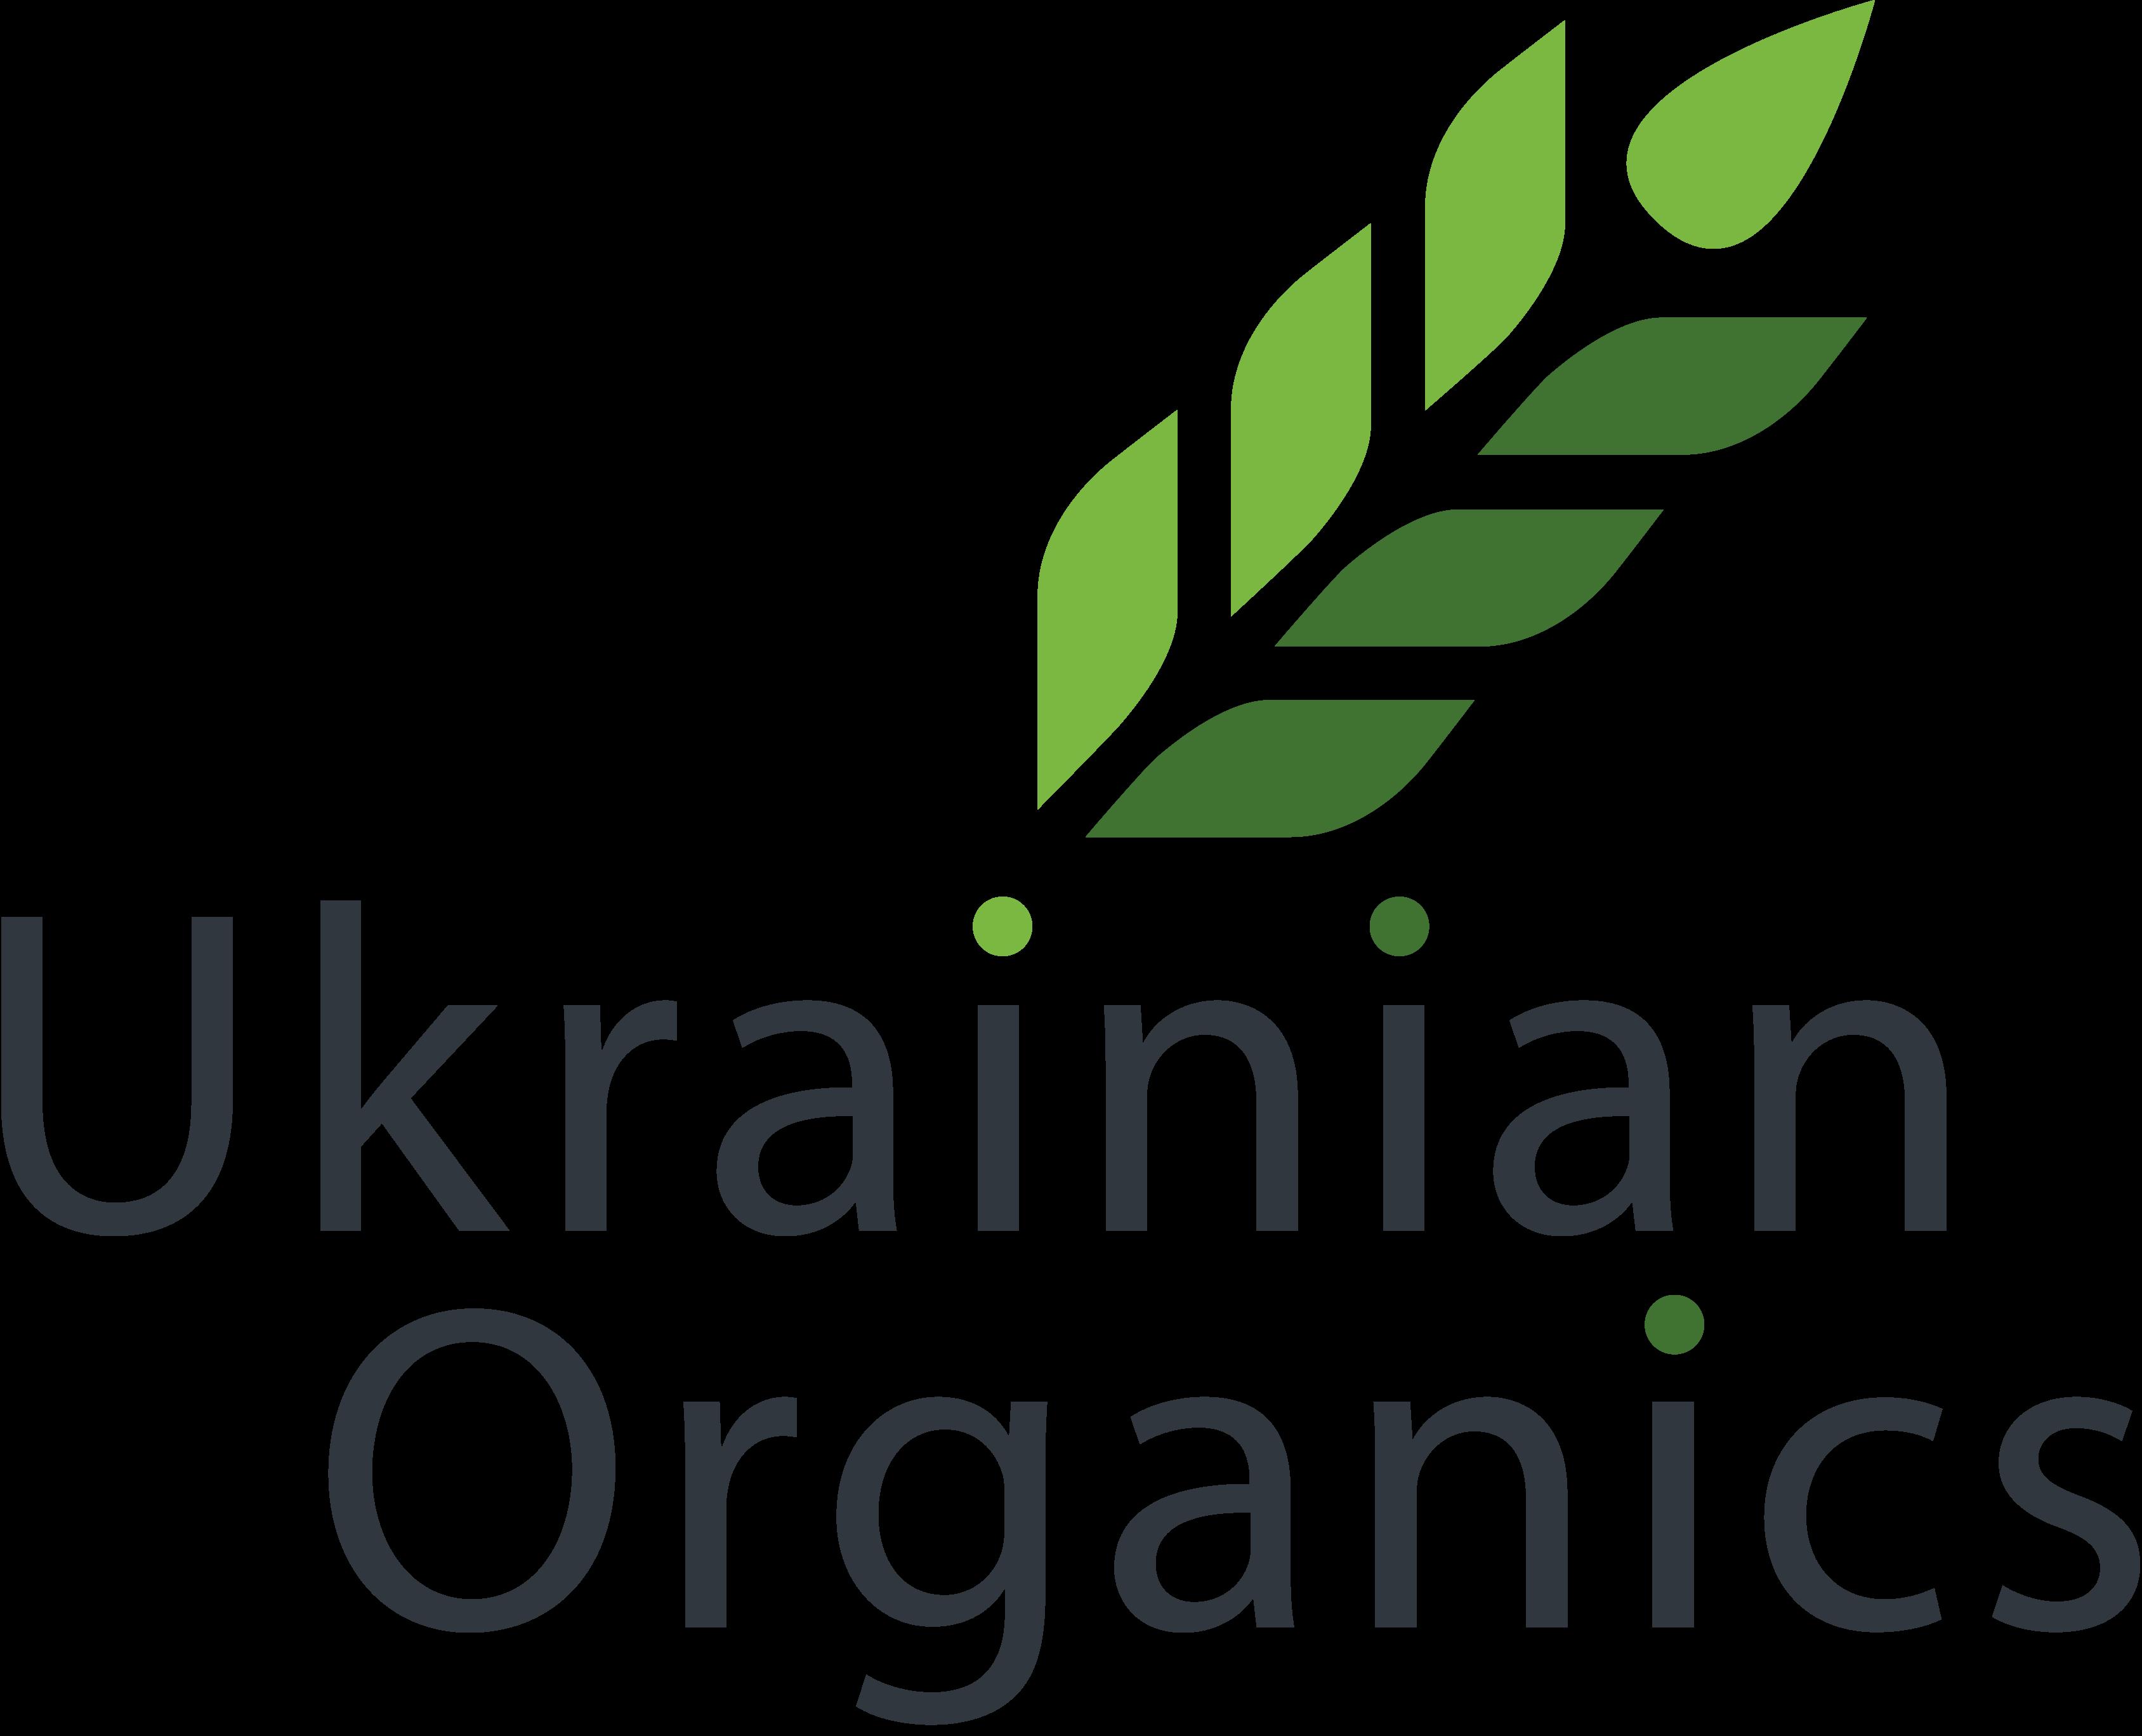 Ukrainian_organics_logo_v2-01 (1)